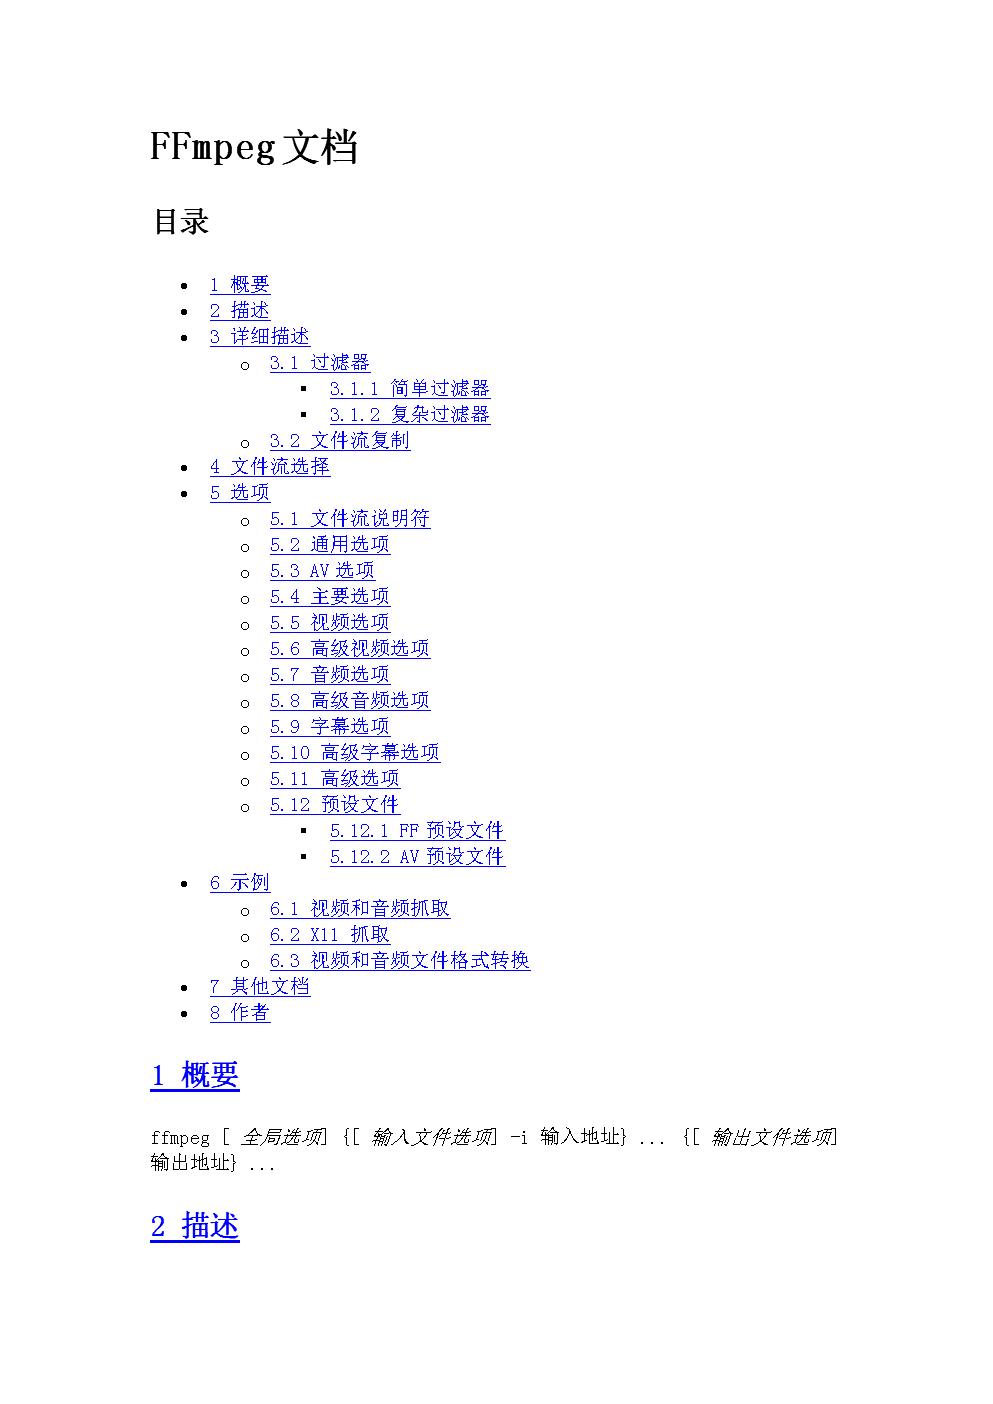 FFmpeg参数大全说明文档.docx